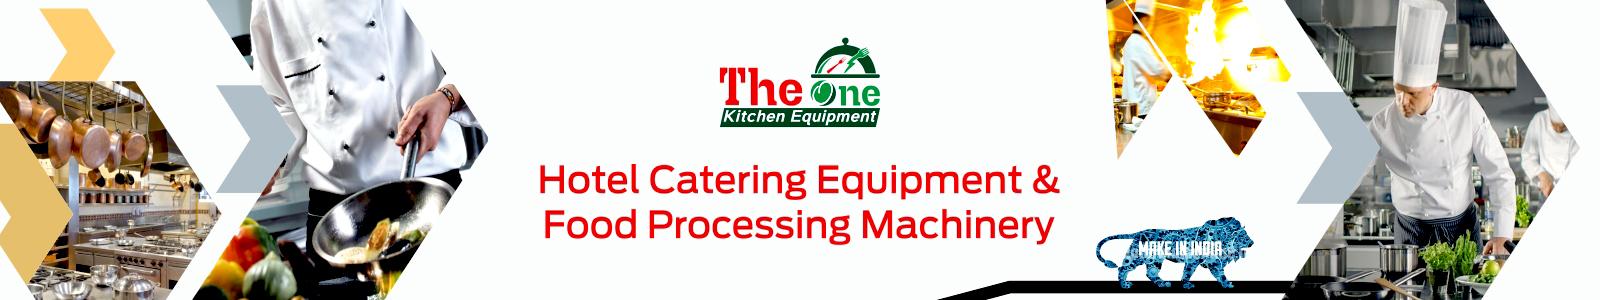 The One Kitchen Equipment